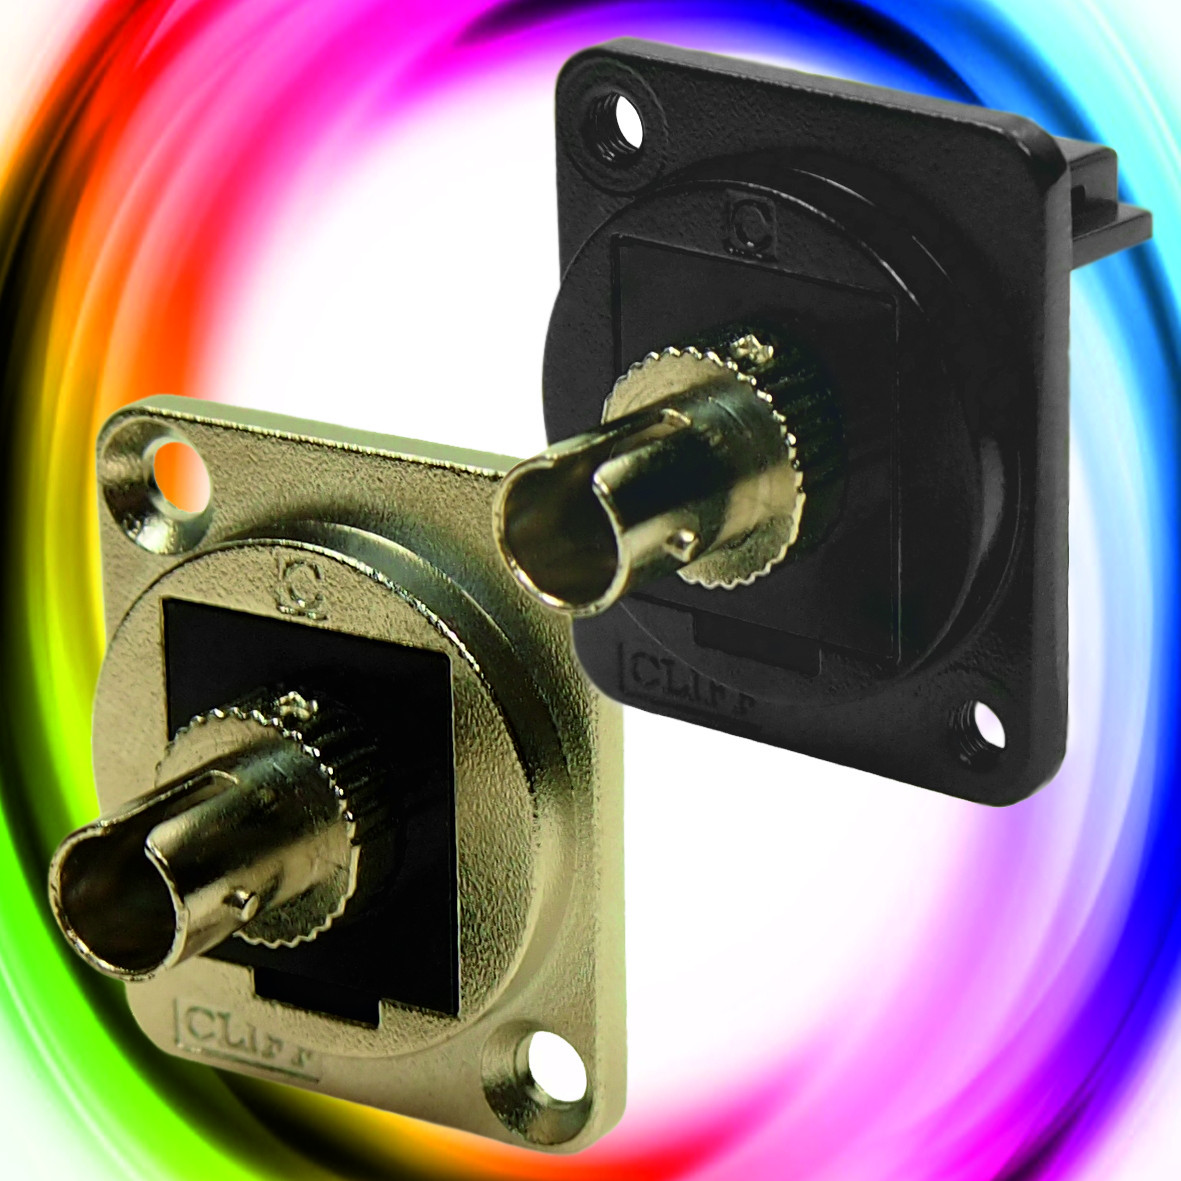 CLIFF Electronic Components - News - ST Fibre Optic Connectors